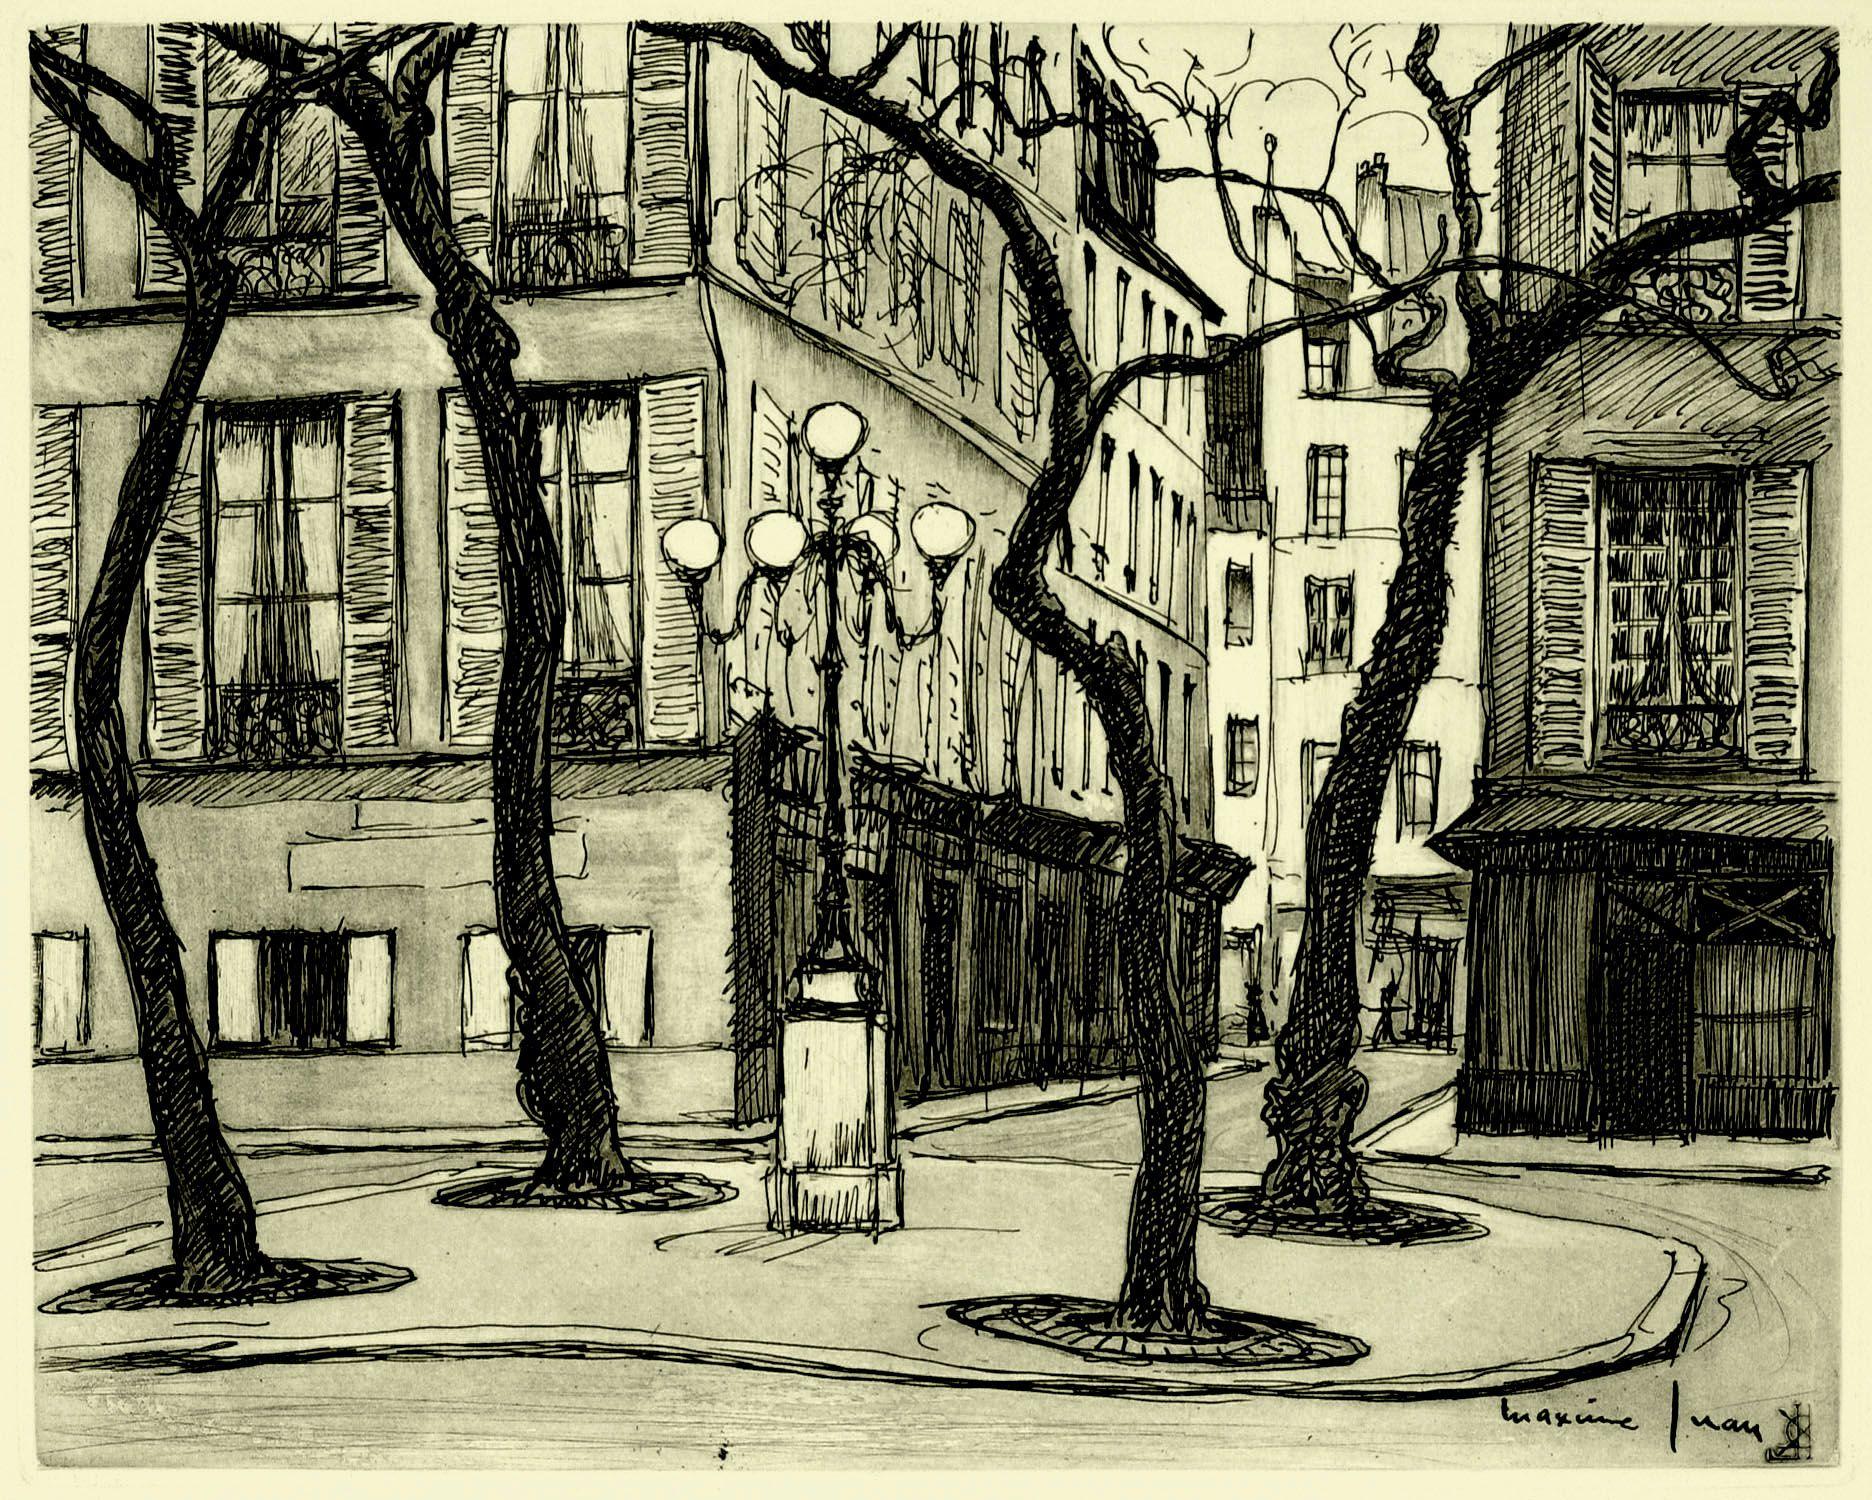 La Place Furstenberg Maxime Juan 1900 - . Catalog